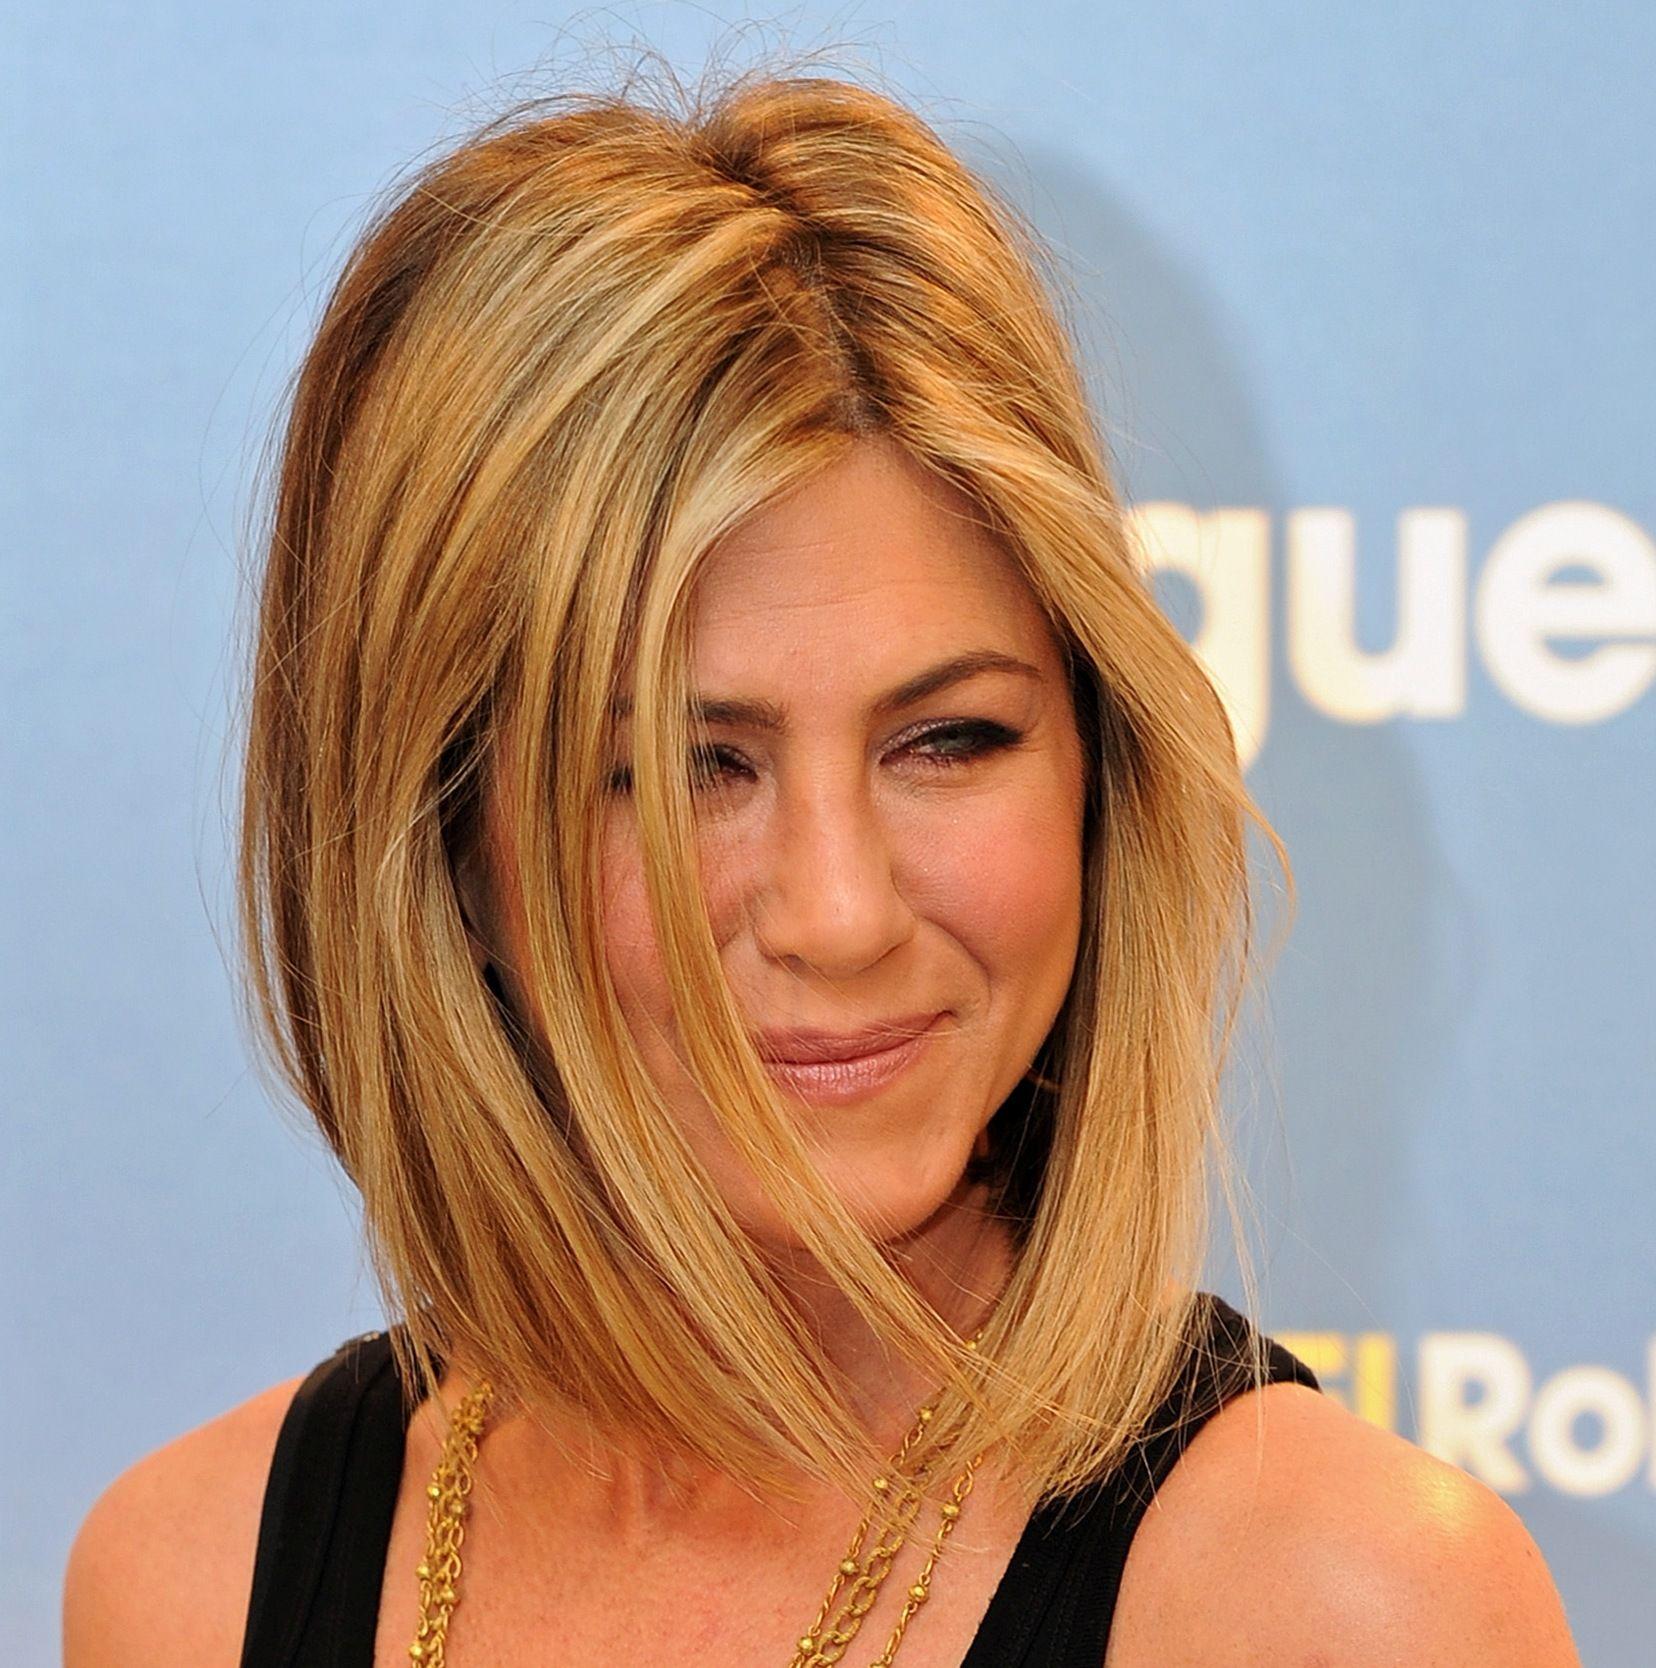 Modern Hairstyles There A New Jenniferrachel Hair Cut